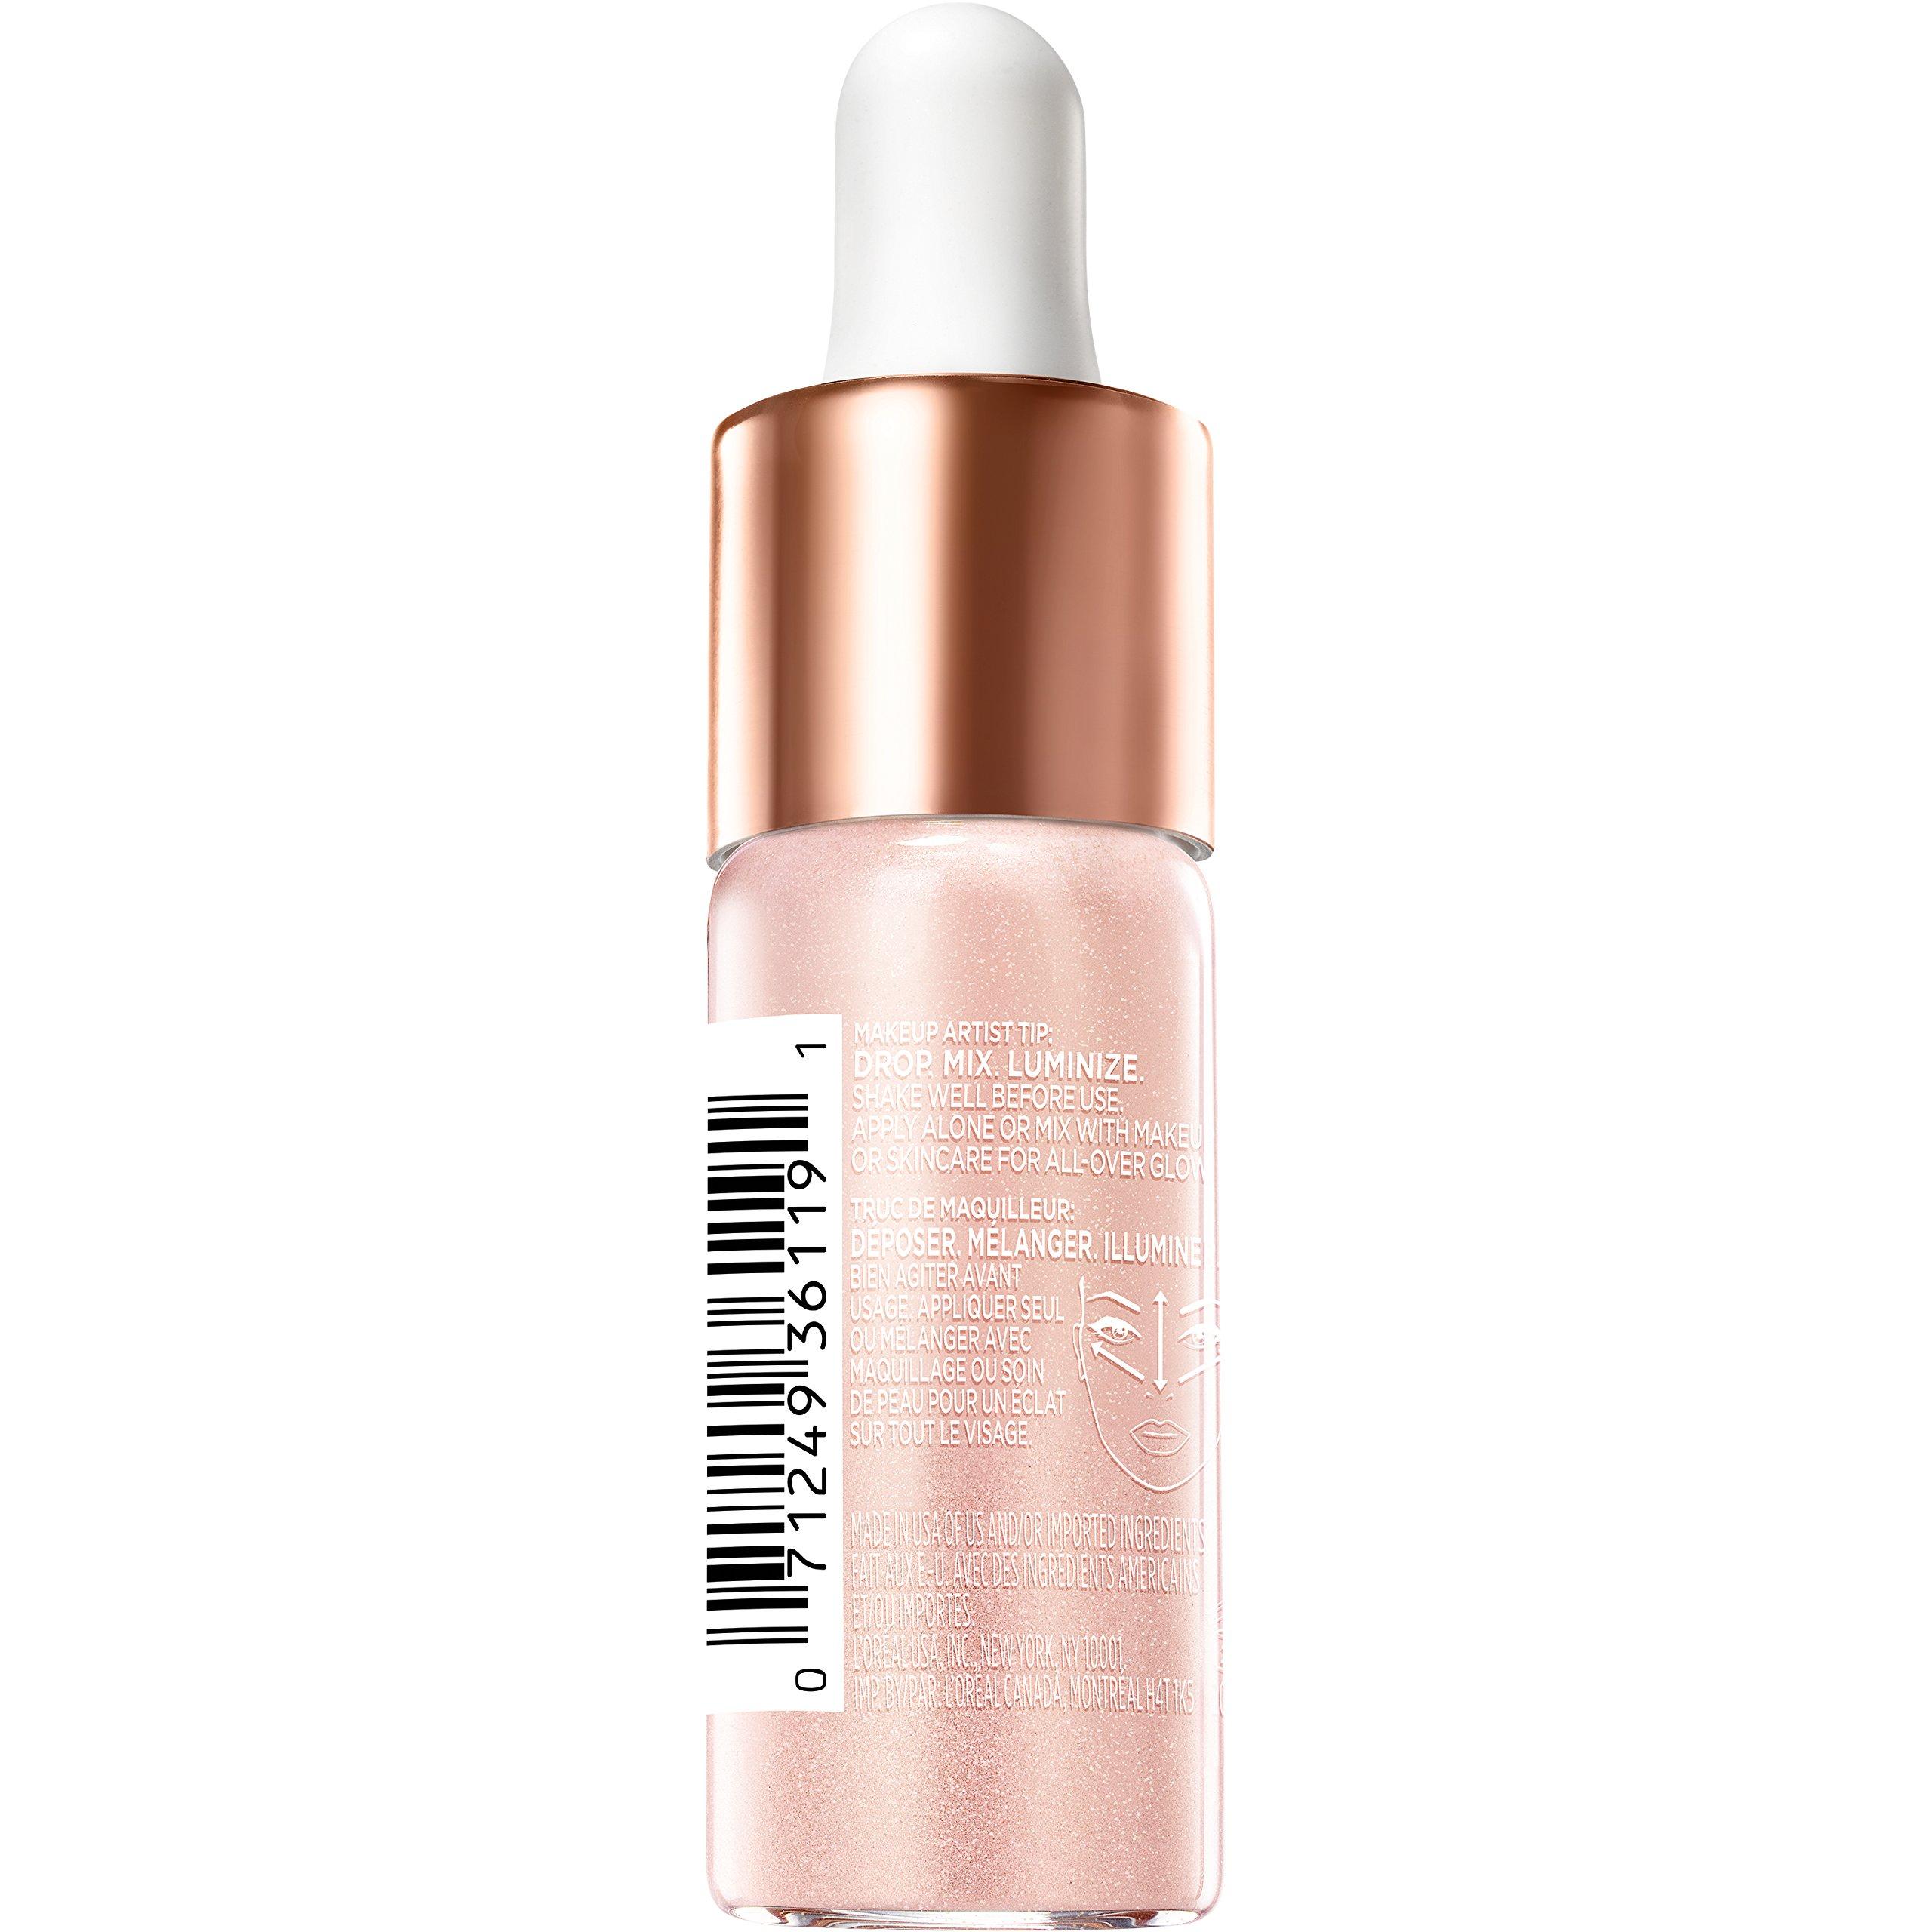 L'Oreal Paris Makeup True Match Lumi Glow Amour Glow Boosting Drops, Daybreak, 0.47 fl. oz. by L'Oreal Paris (Image #3)